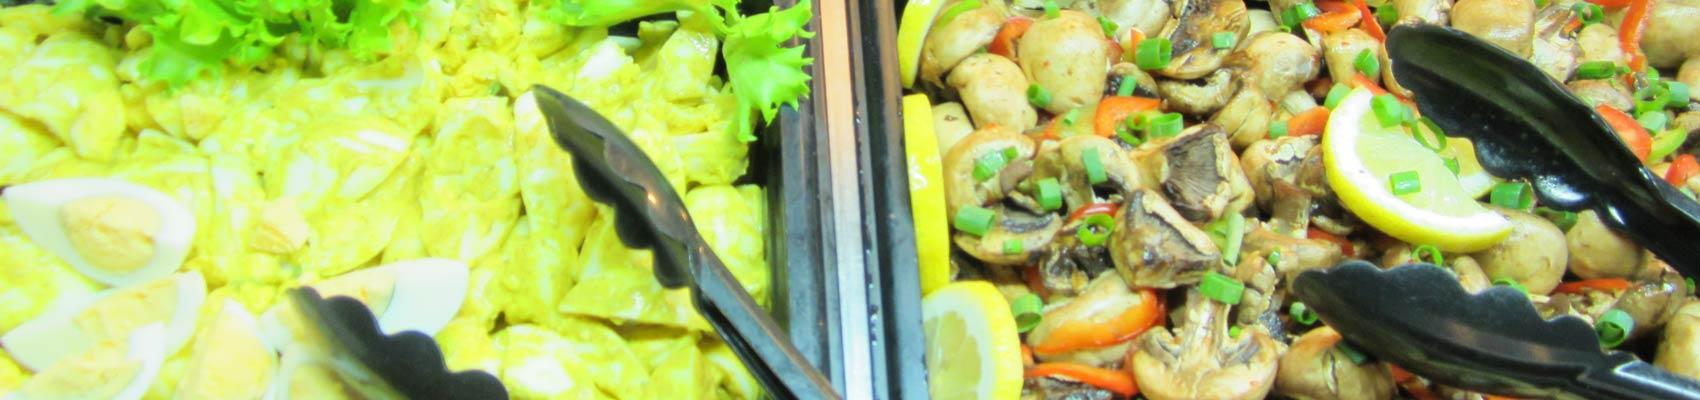 lyndoch-hotel-salad-banner